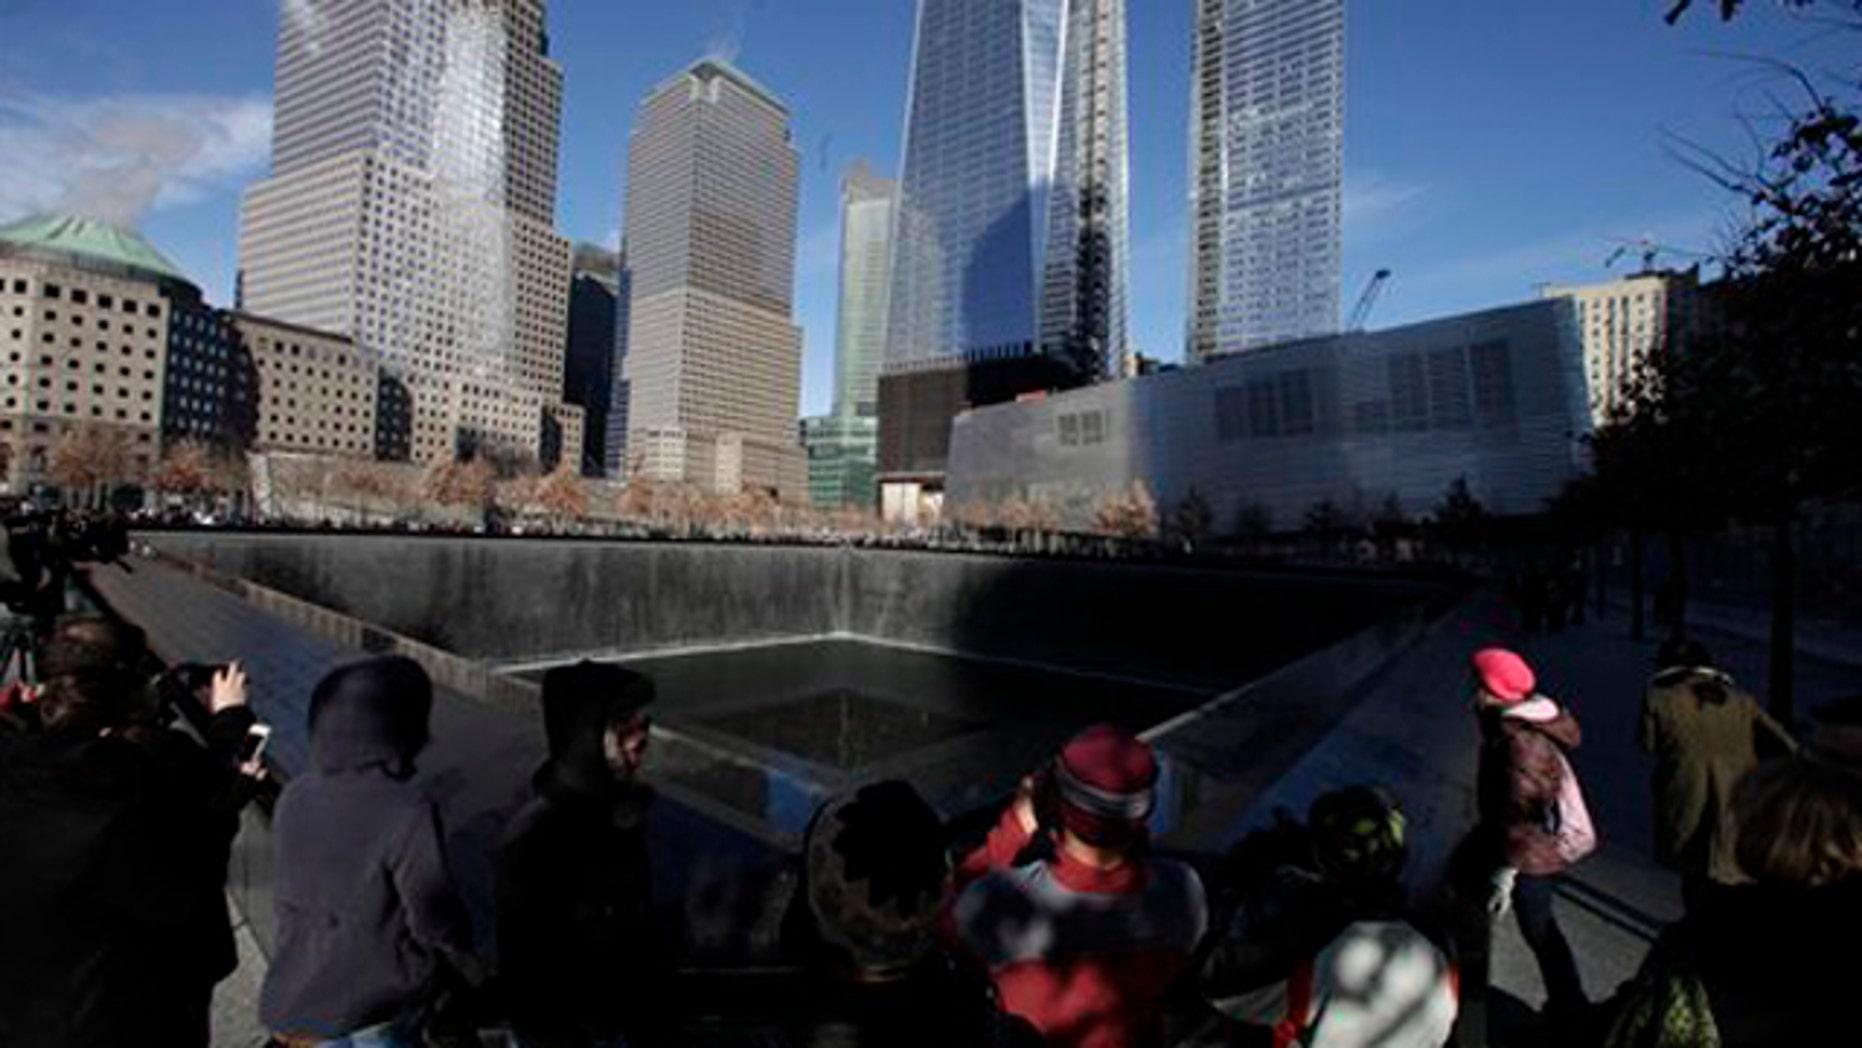 December 29, 2011: Visitors walk around the National September 11 Memorial.